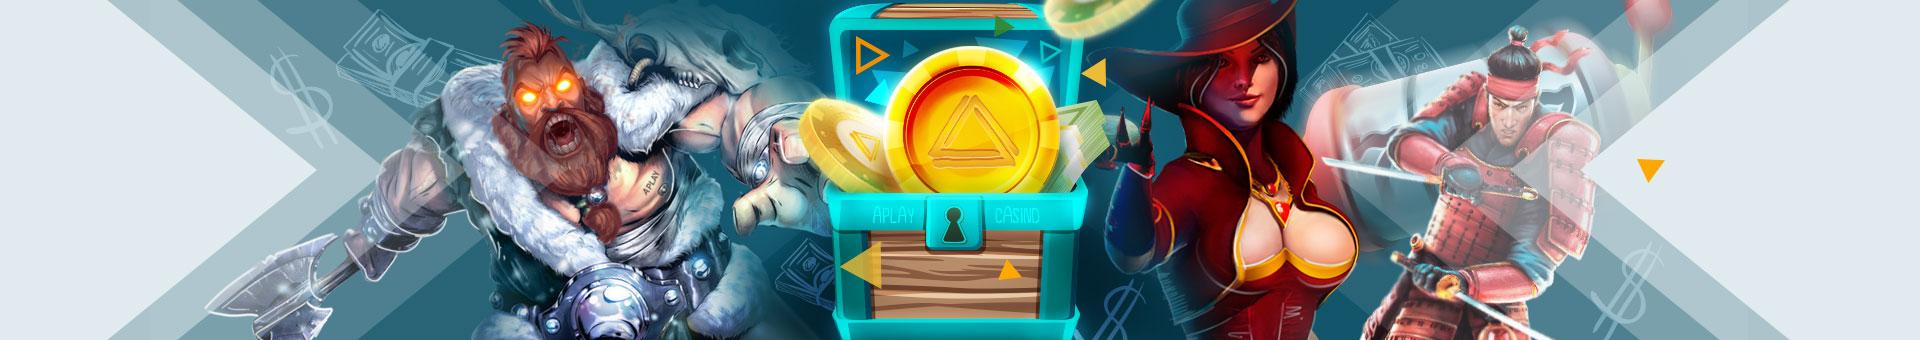 azartplay официальный сайт онлайн казино